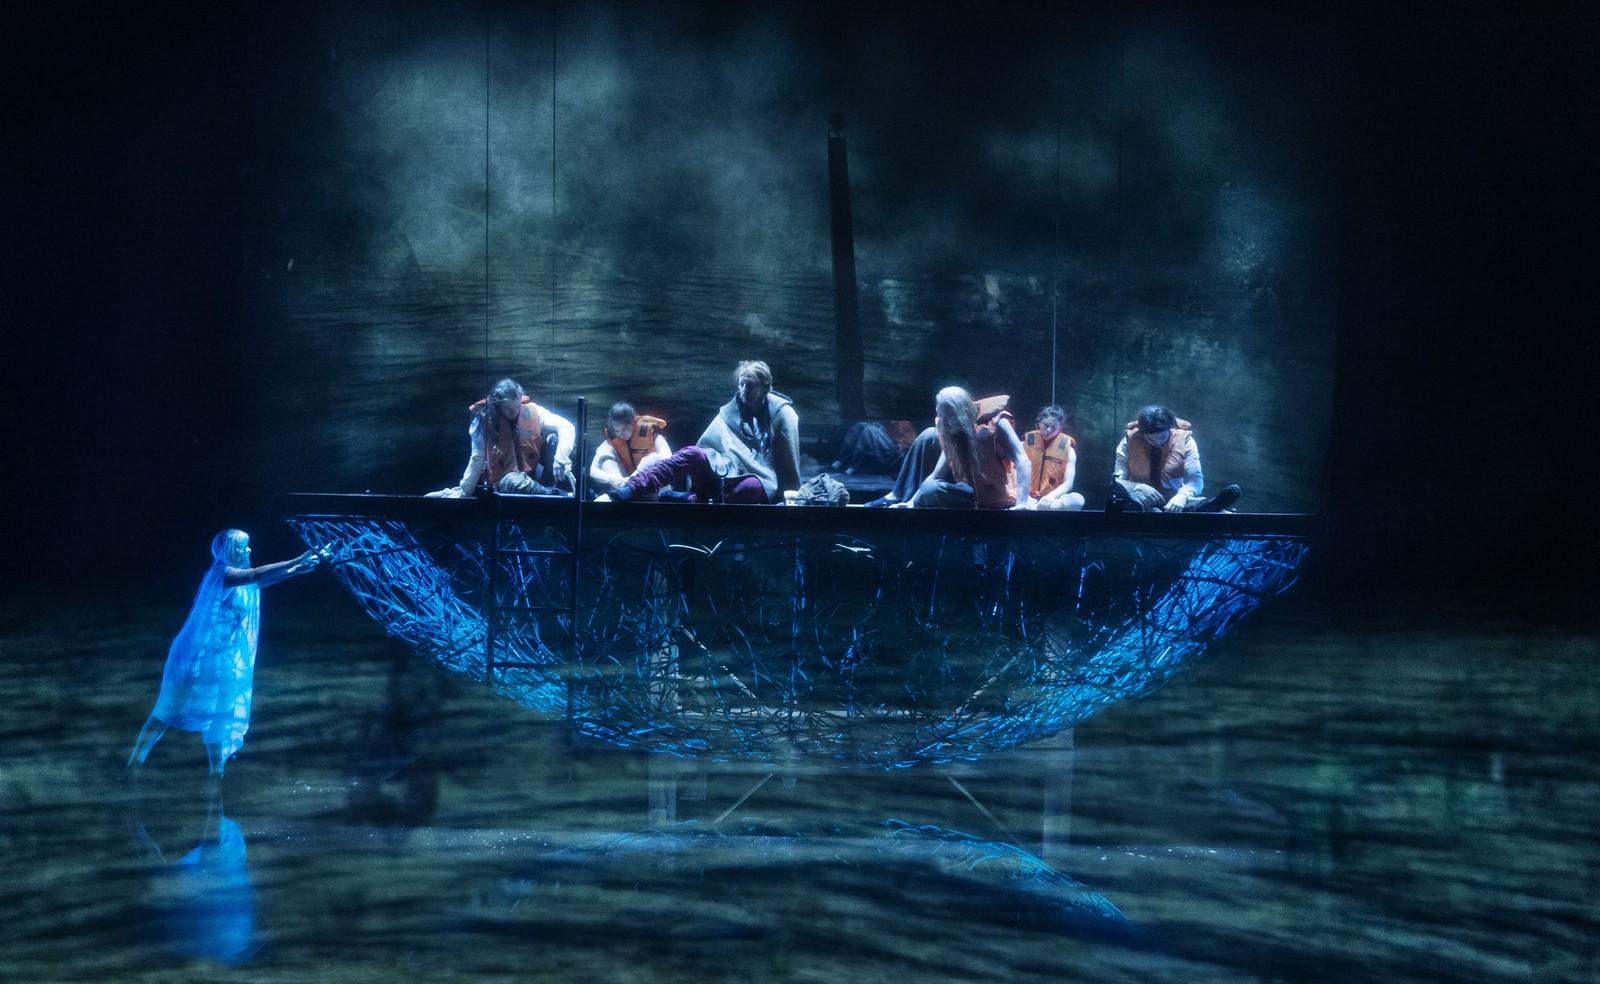 Anmeldelse: Kongens fald, Det Kongelige Teater (co-produktion med Aarhus Teater)